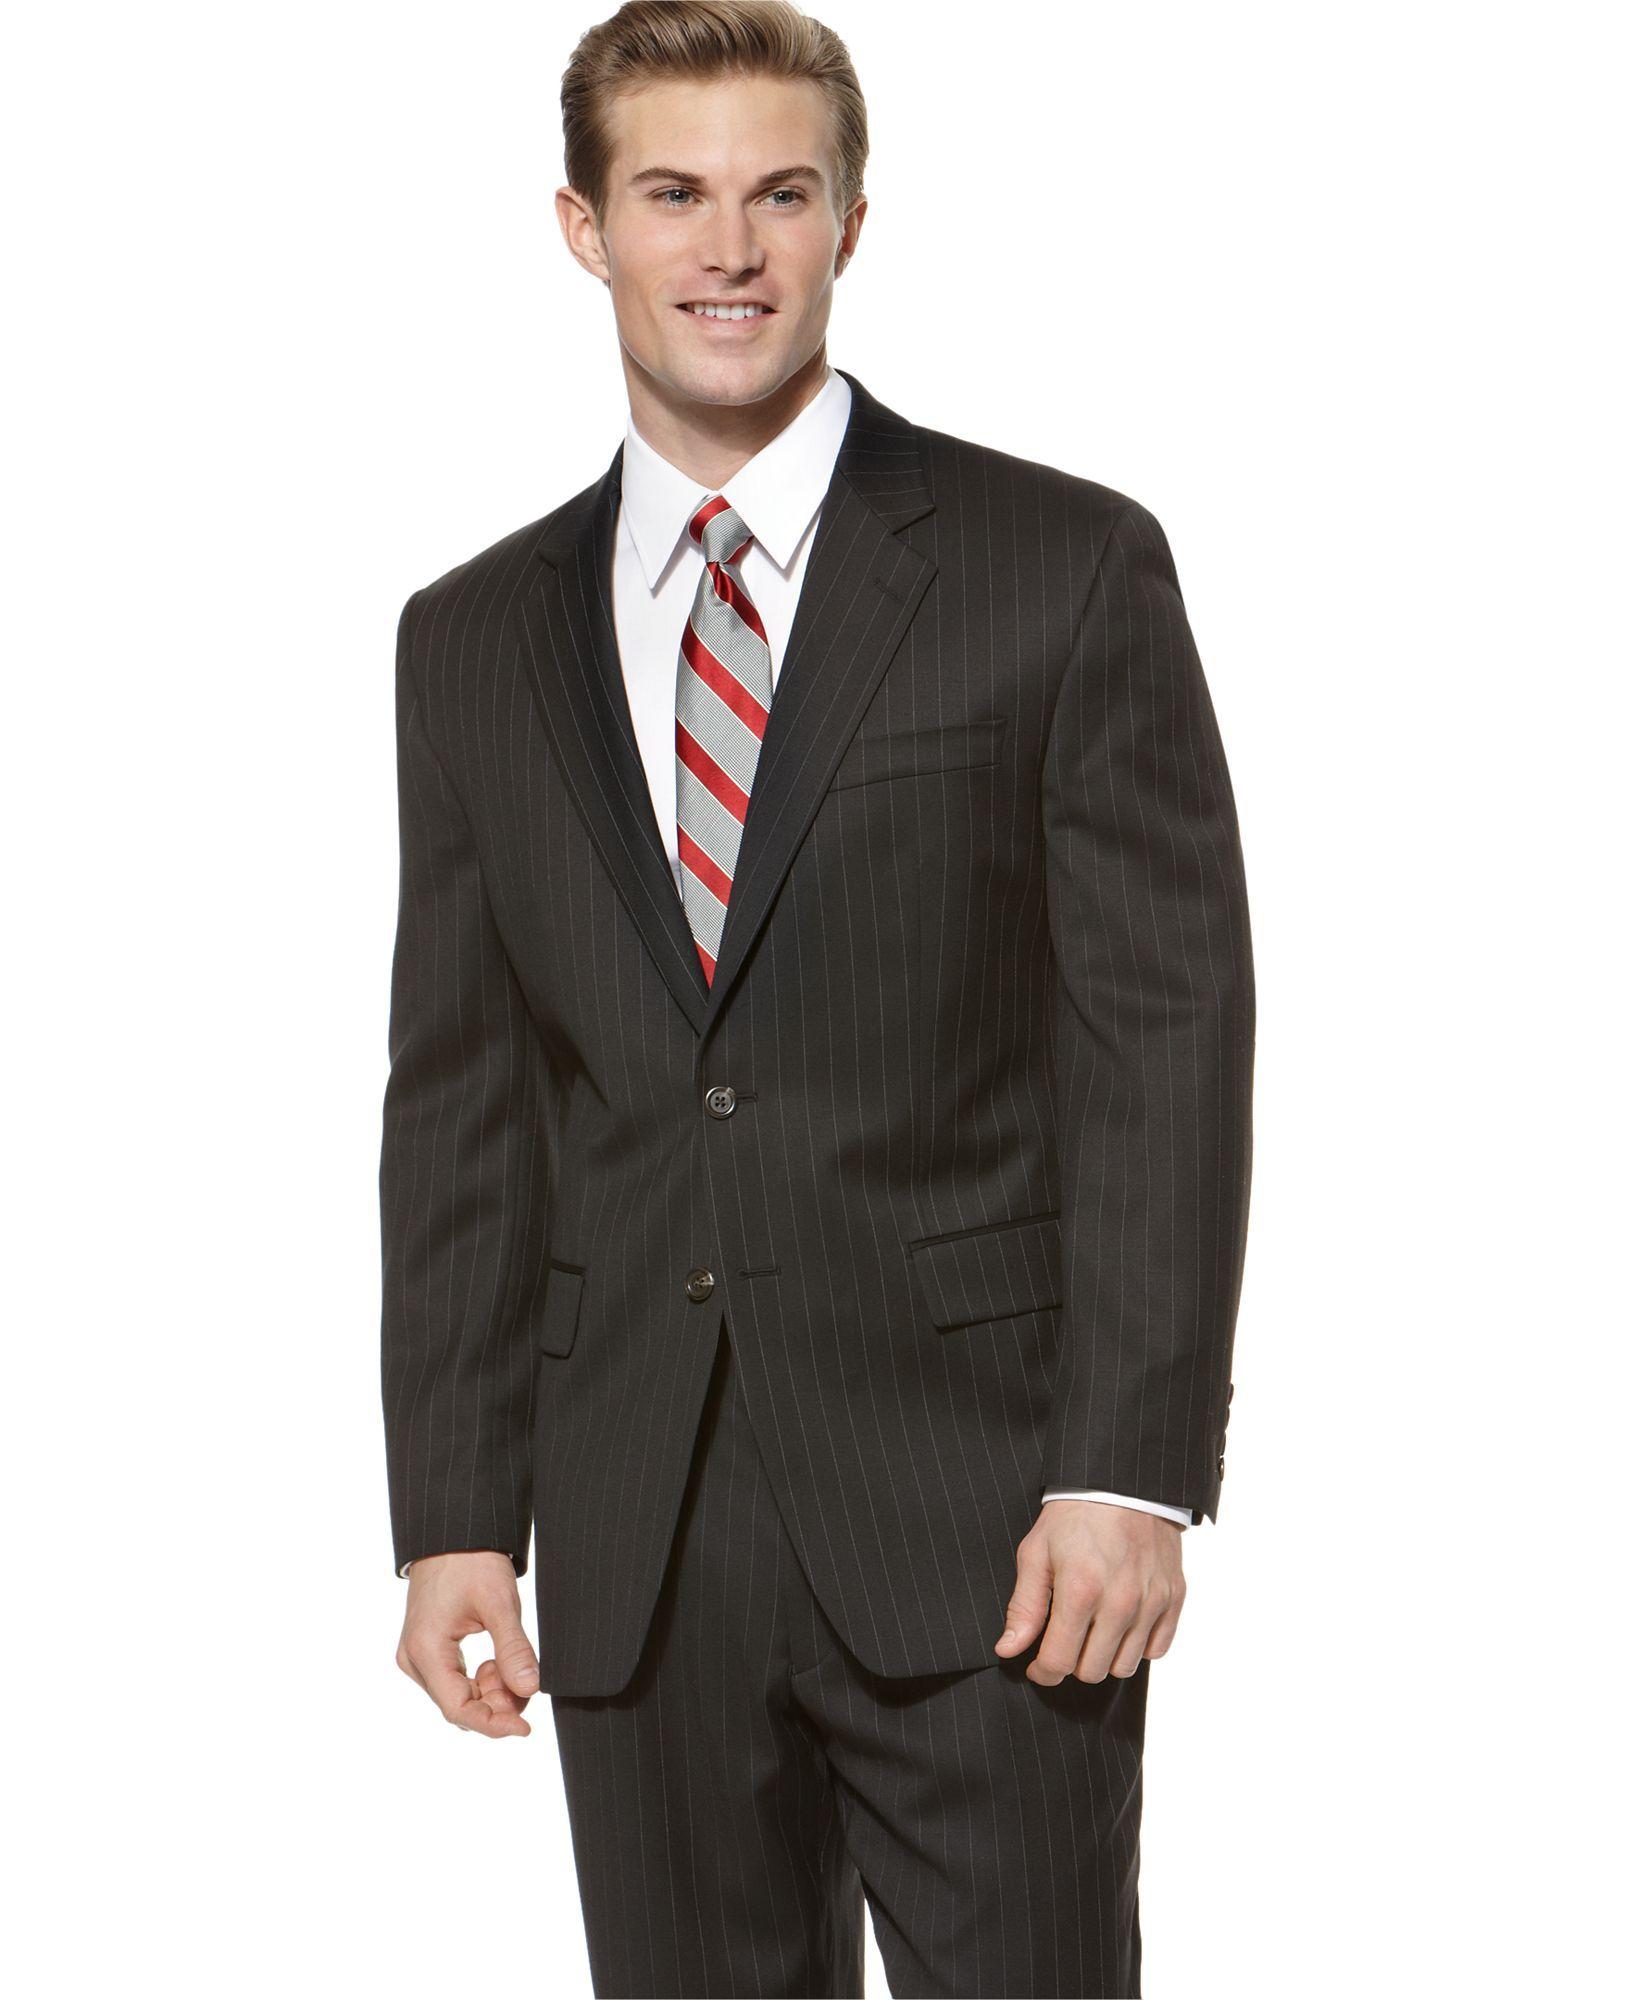 Chris Austad for Macy's (2010) Ralph lauren suits, Ralph